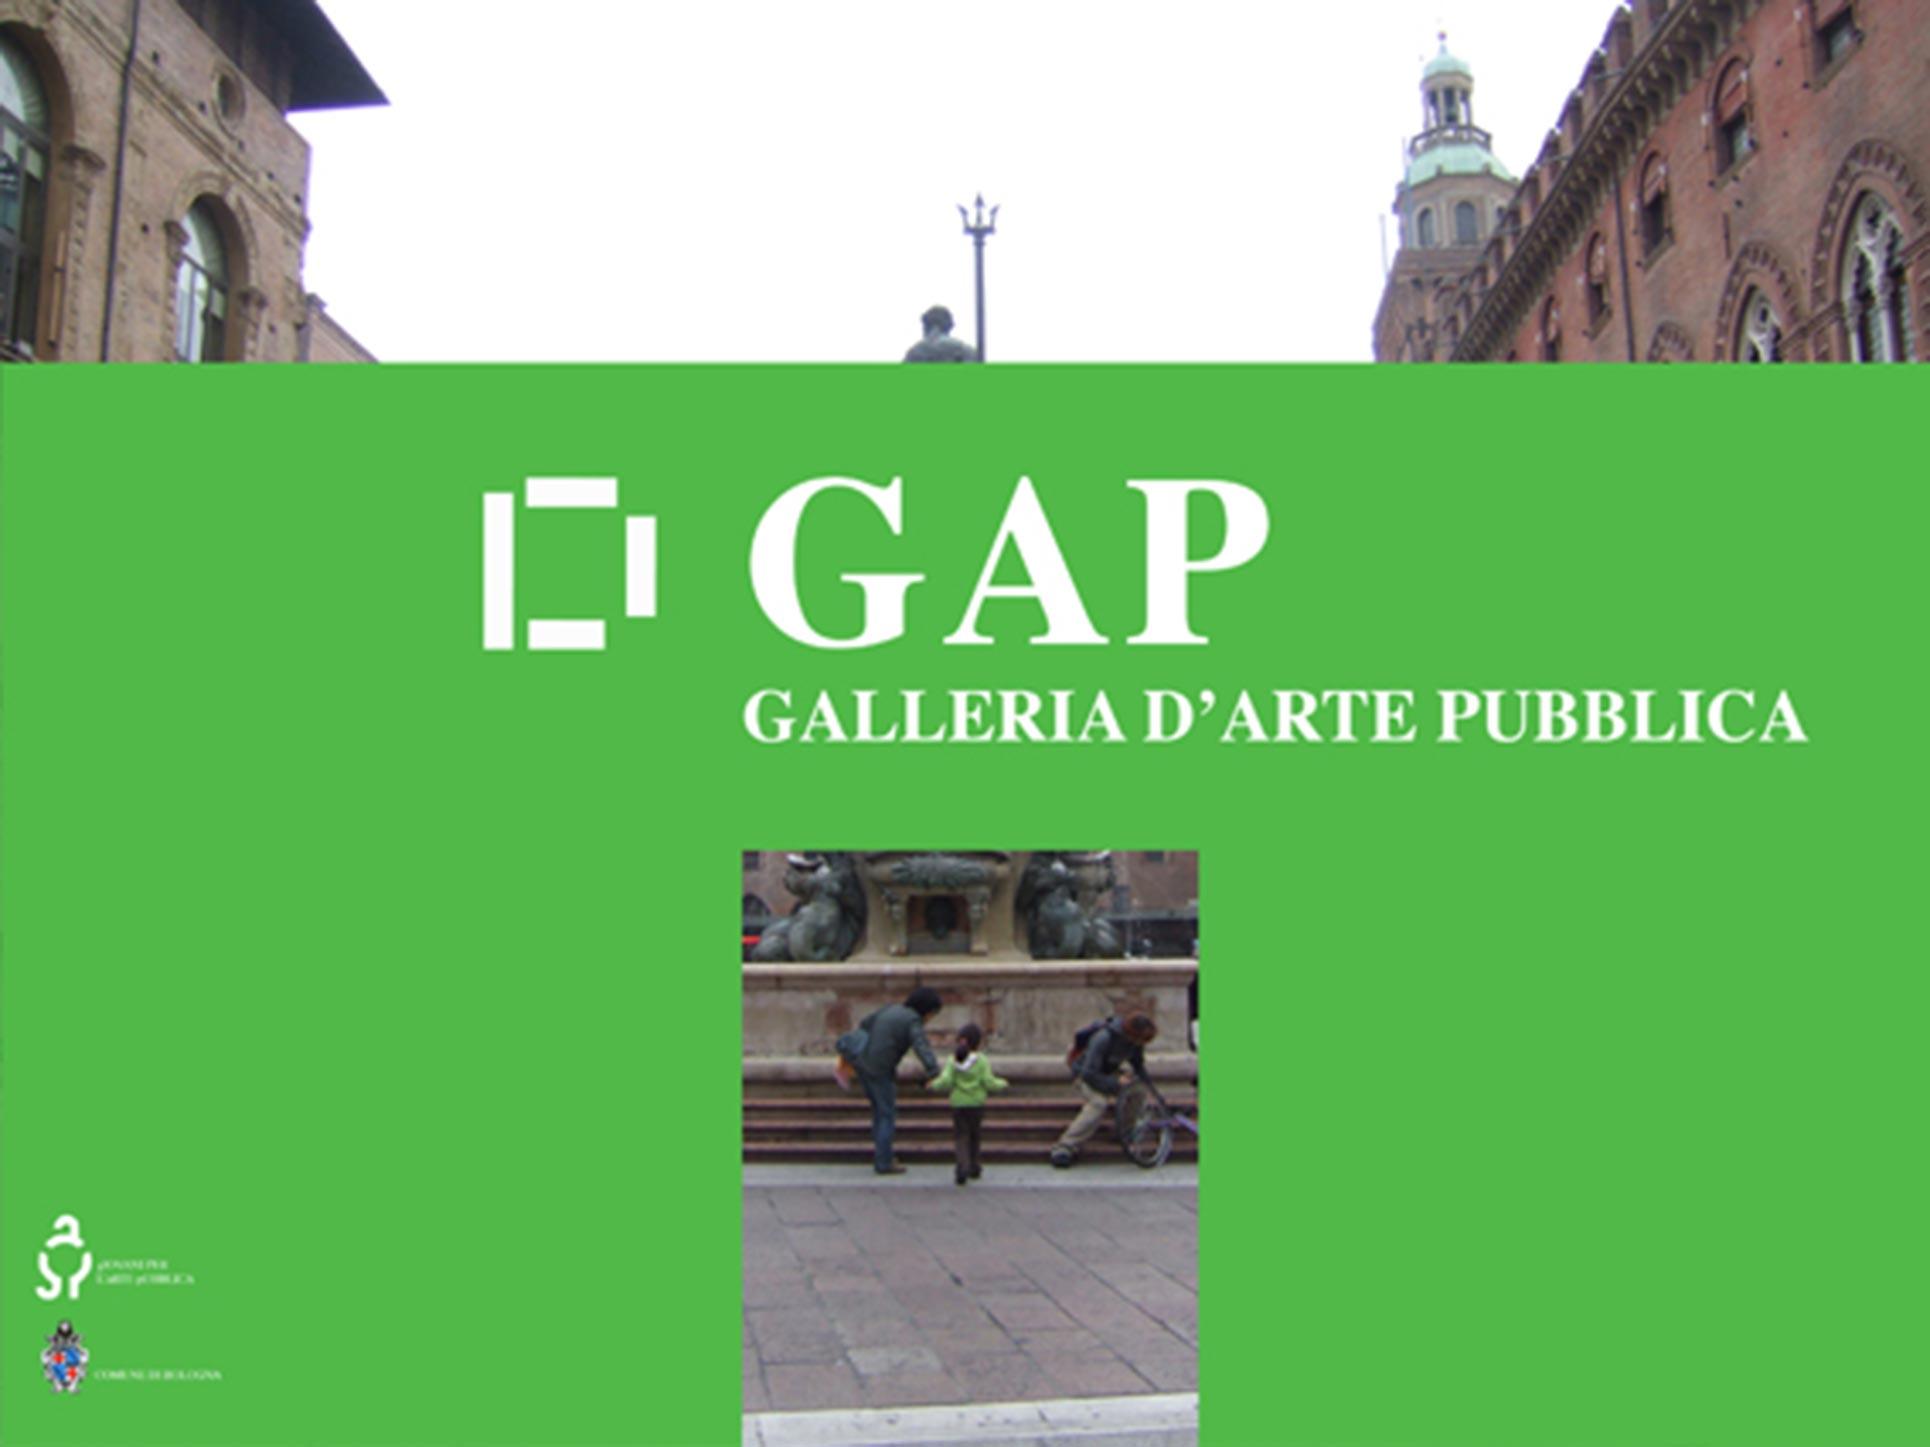 GAP, Galleria d'arte pubblica, proposal of the GAP Young artists Workshop, 2008 Bologna